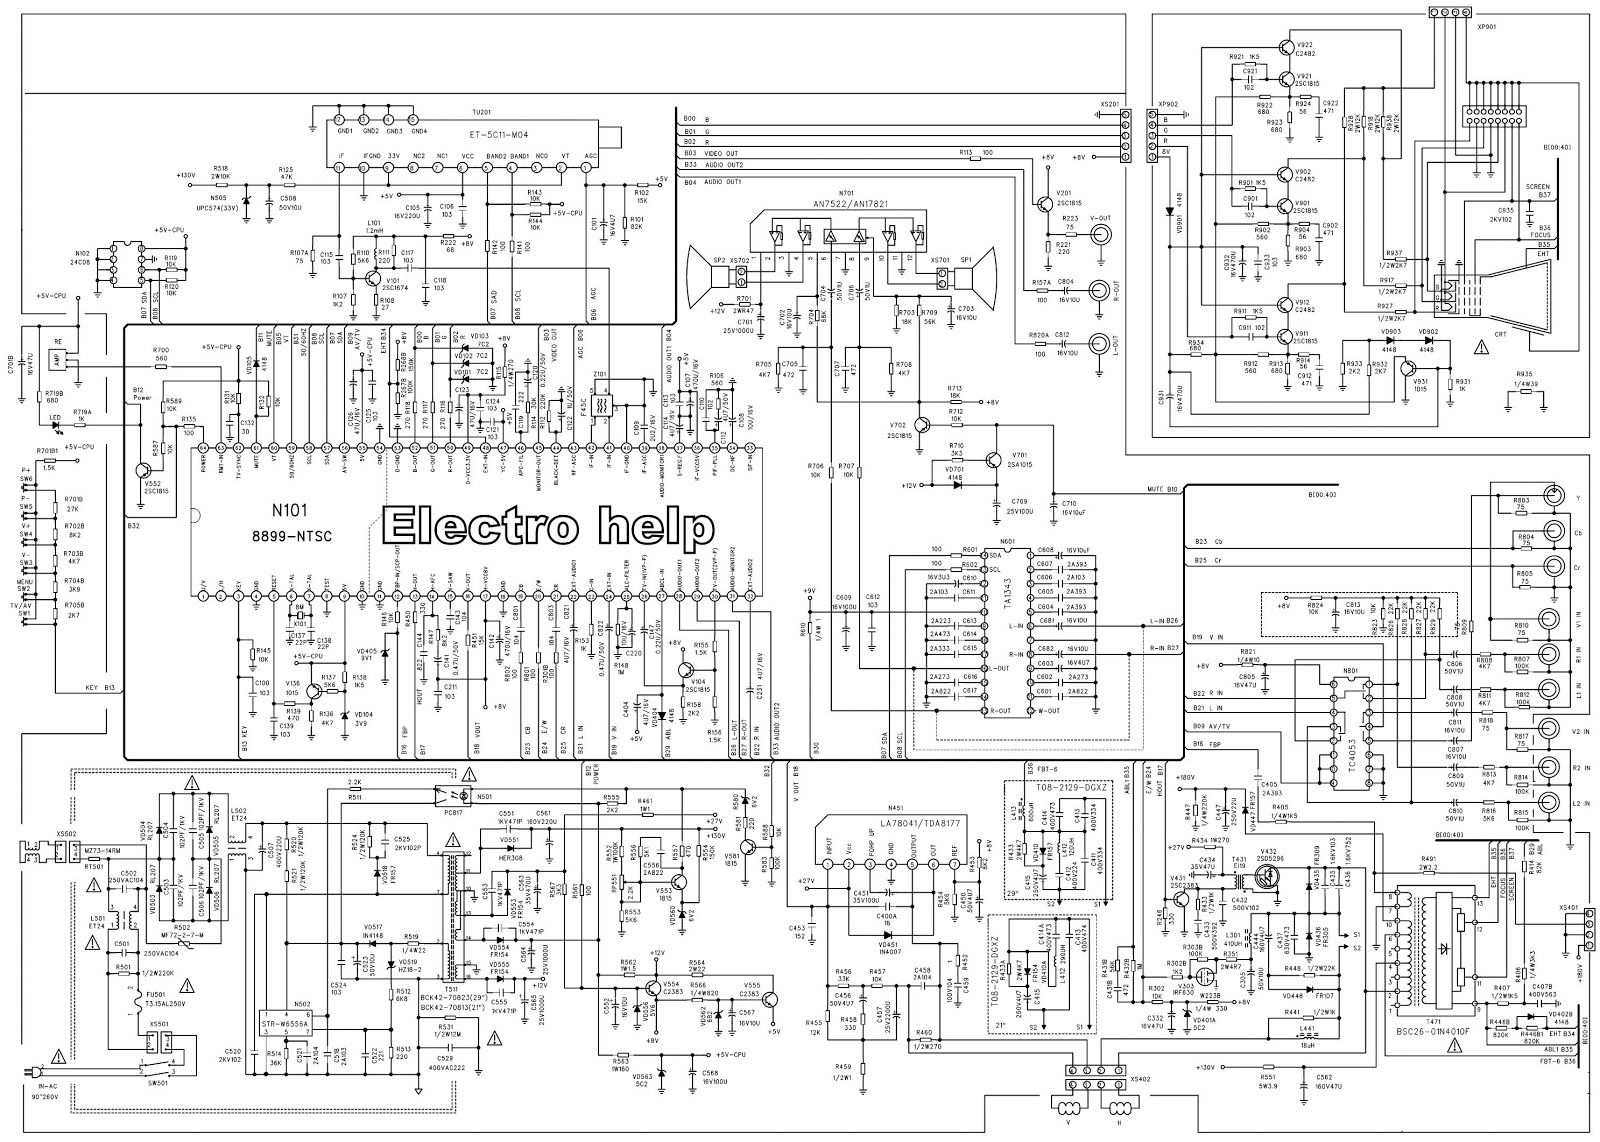 [DIAGRAM] Service Manual Schematic Diagrams Ittpact 80